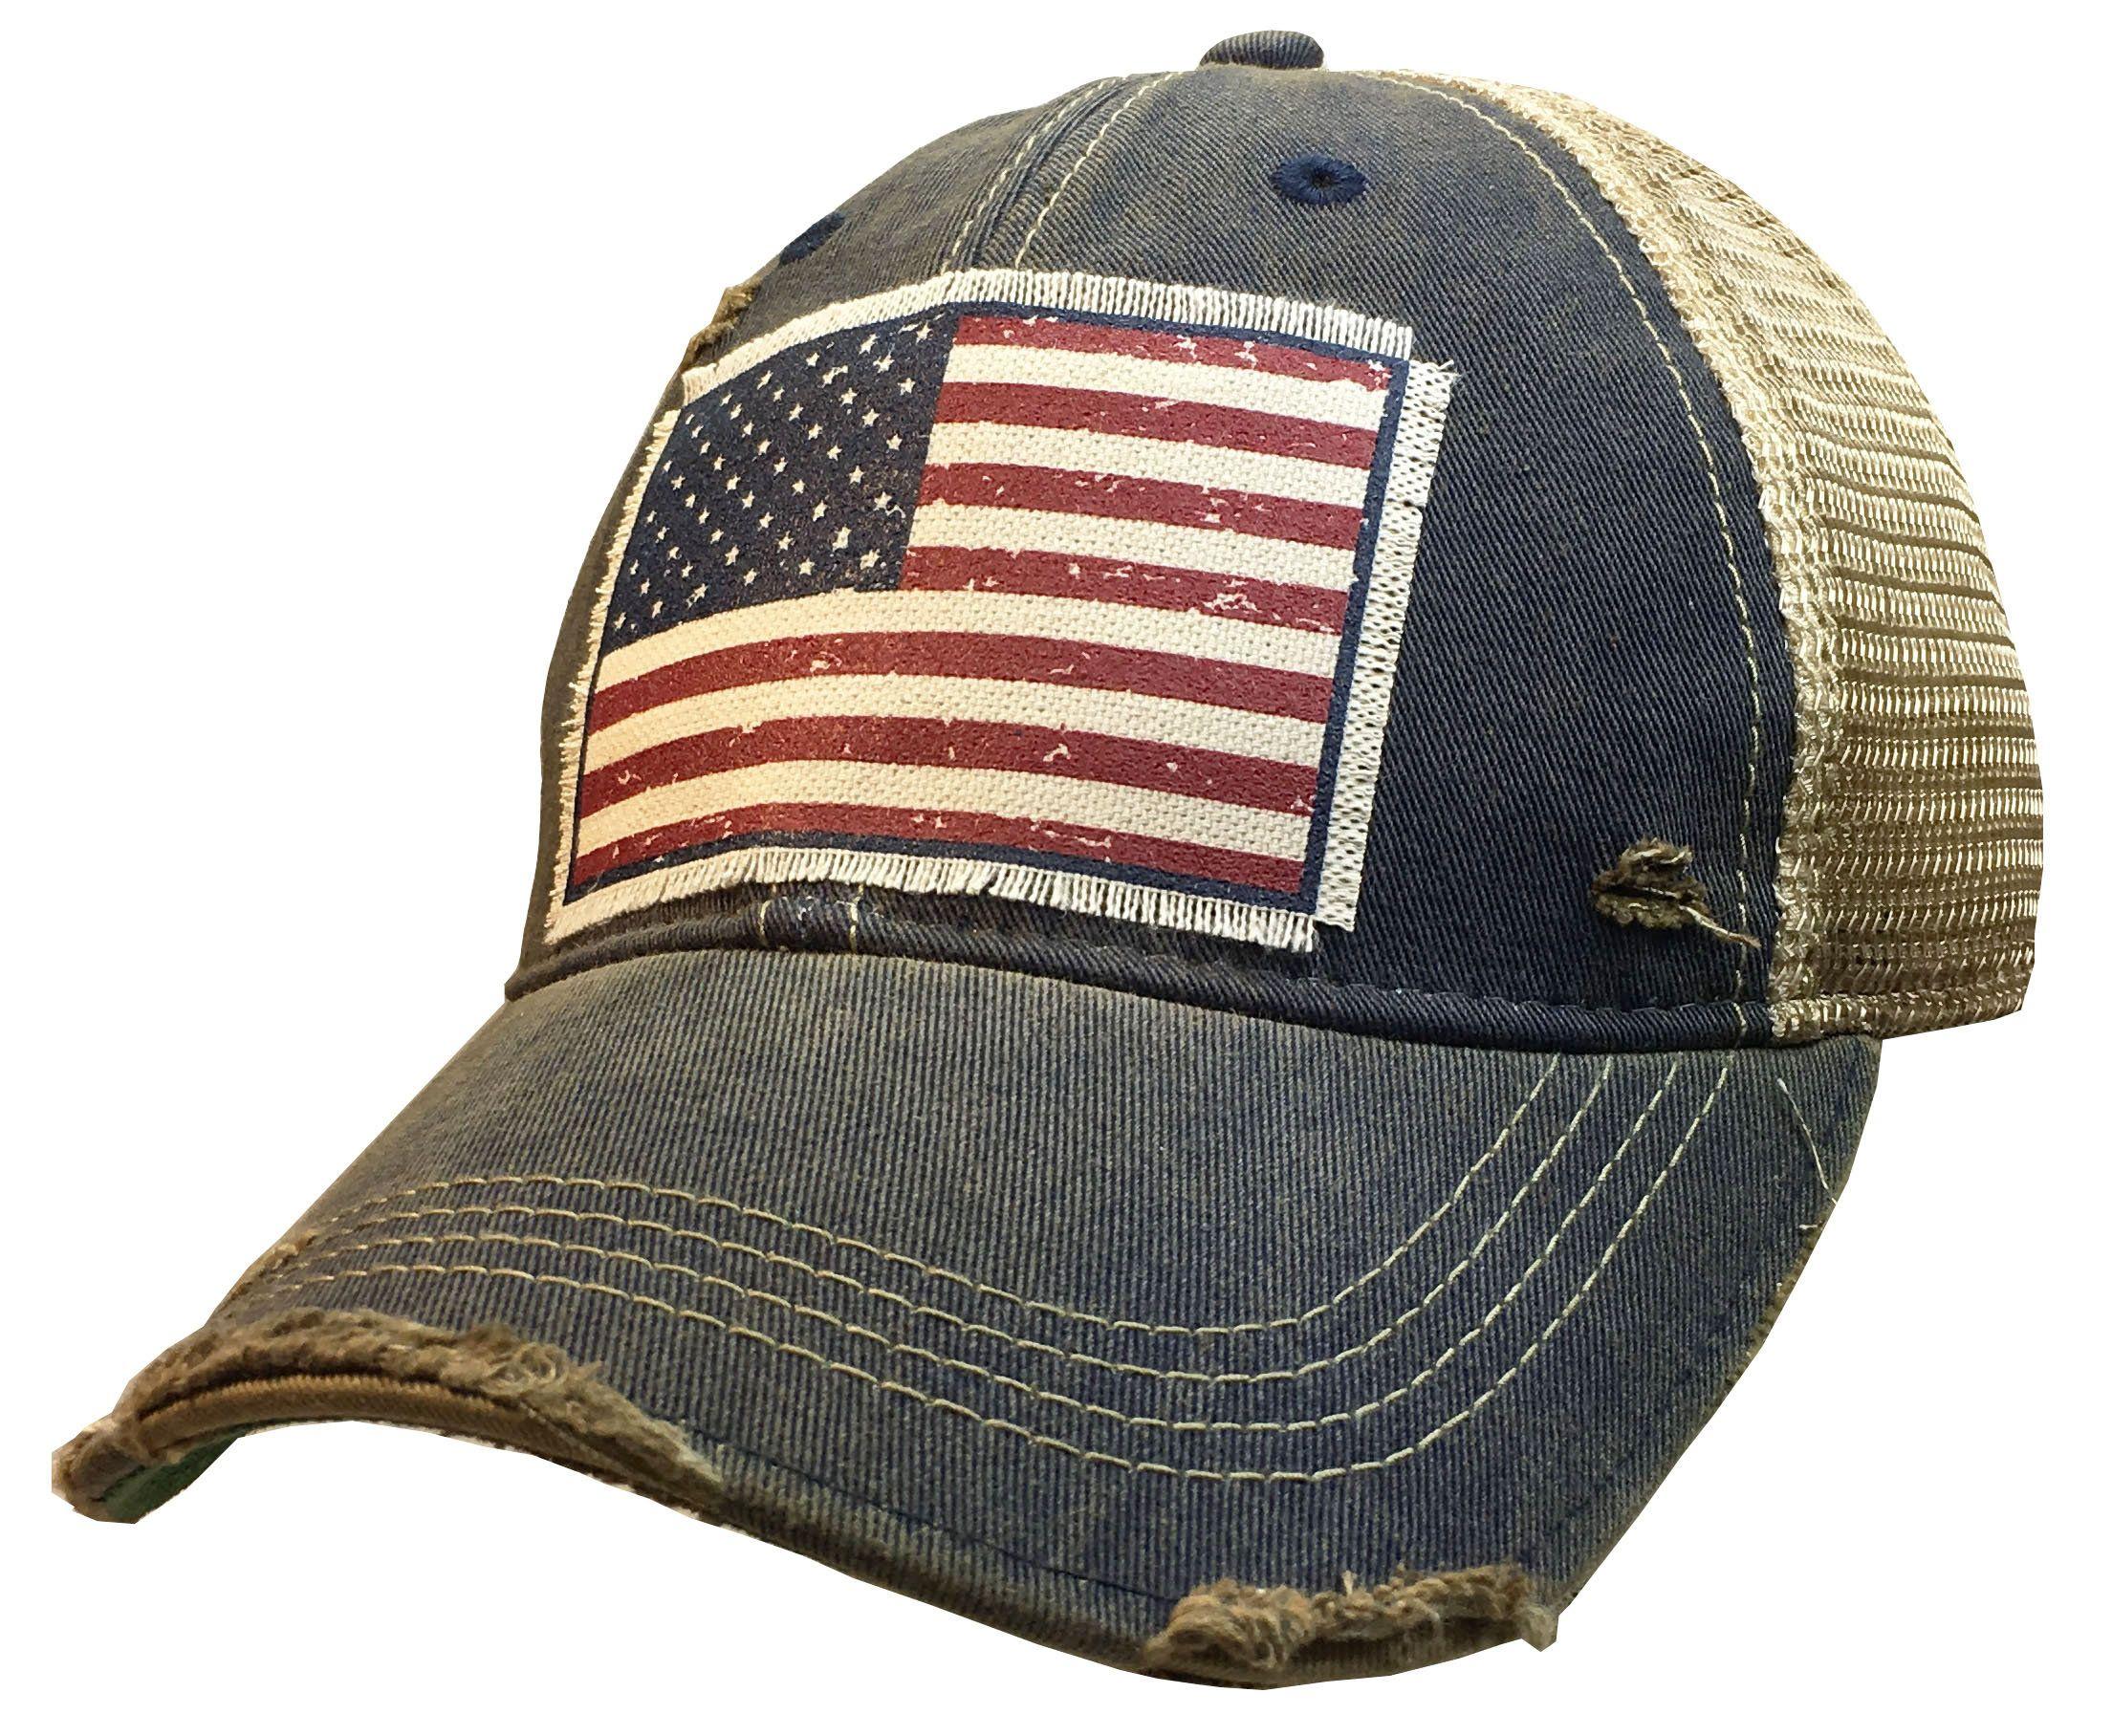 American Flag Usa Vintage Distressed Trucker Cap Men S Etsy In 2020 American Flag Hat Mesh Cap Womens Hats Baseball